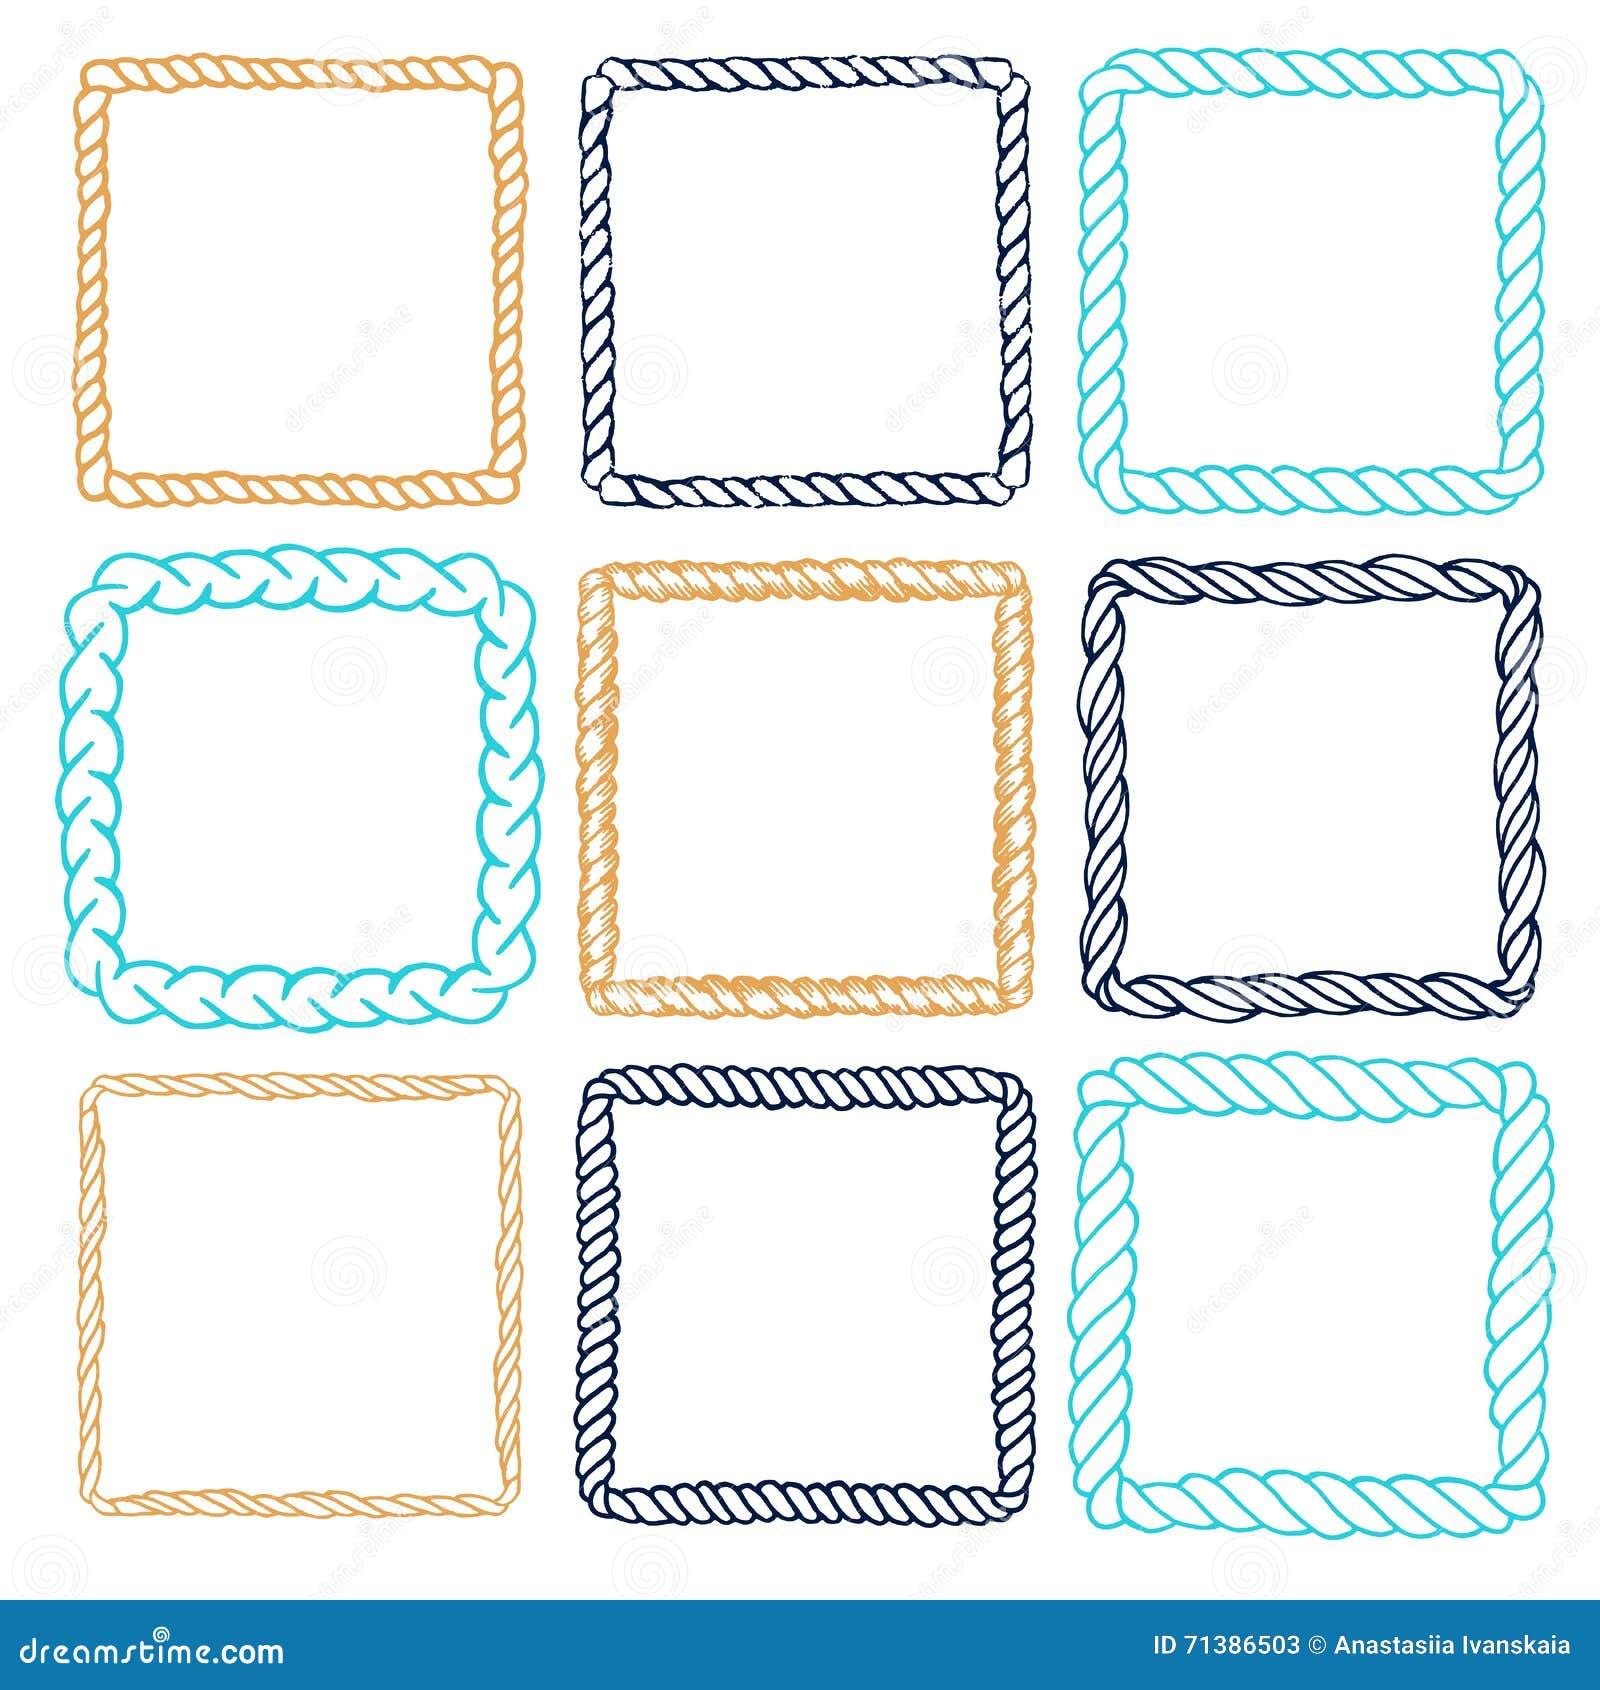 Decorative frames set download free vector art stock graphics - Set Of 9 Decorative Square Border Frames Stock Vector